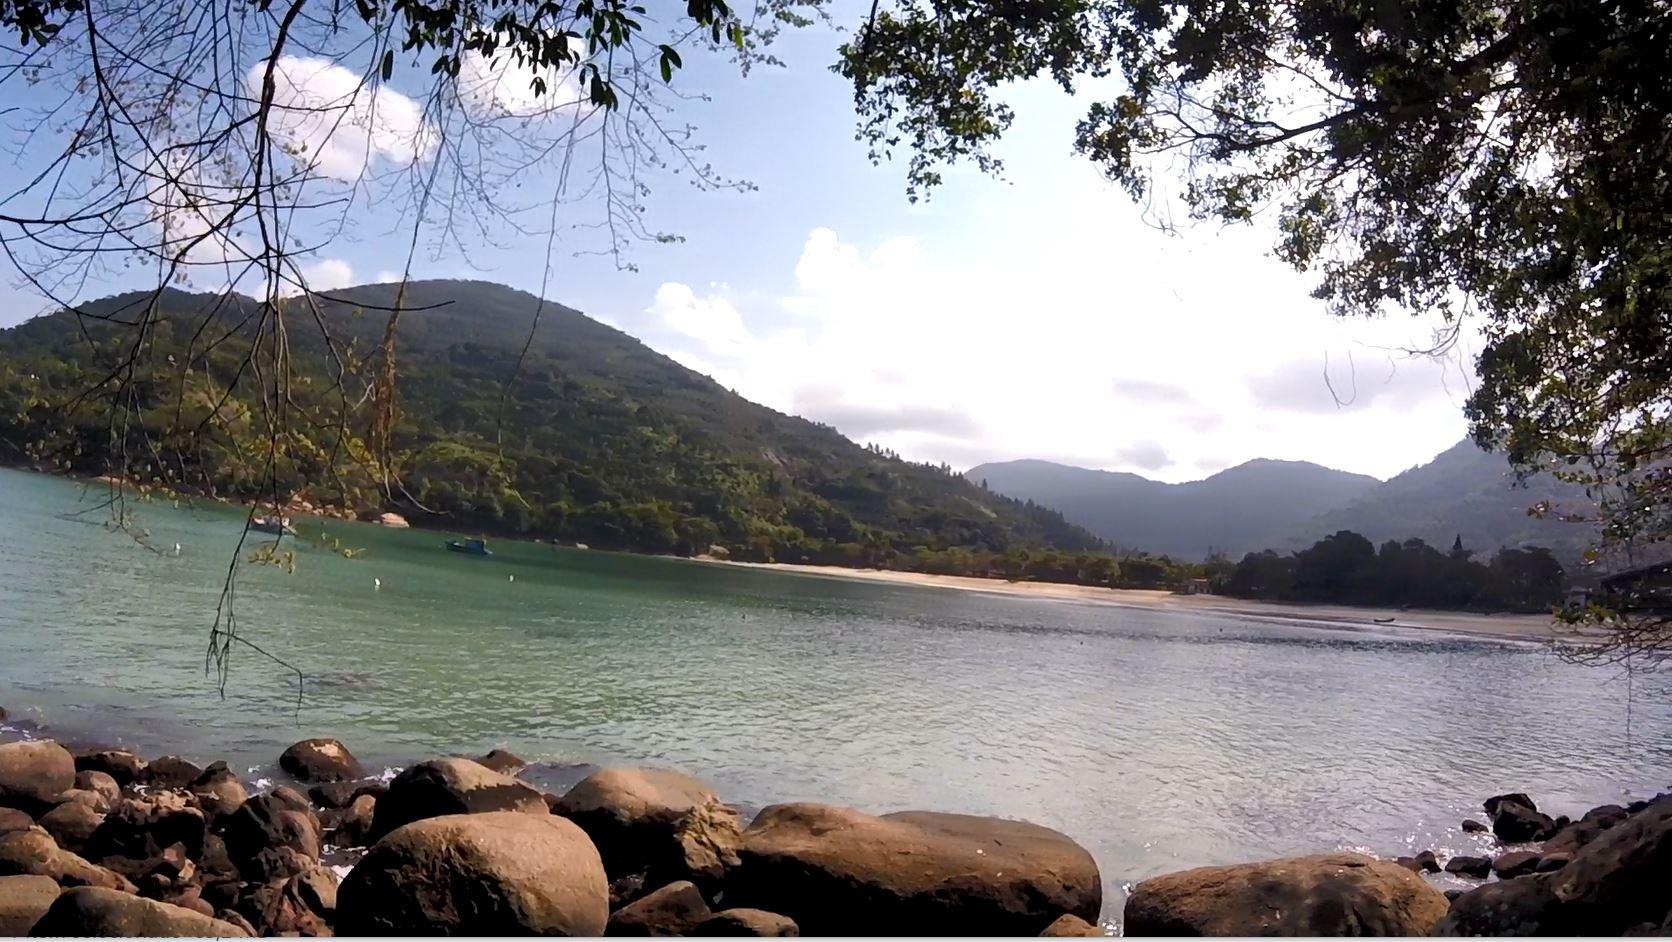 Trilha Praia de Santa Rita - Perequê Mirim